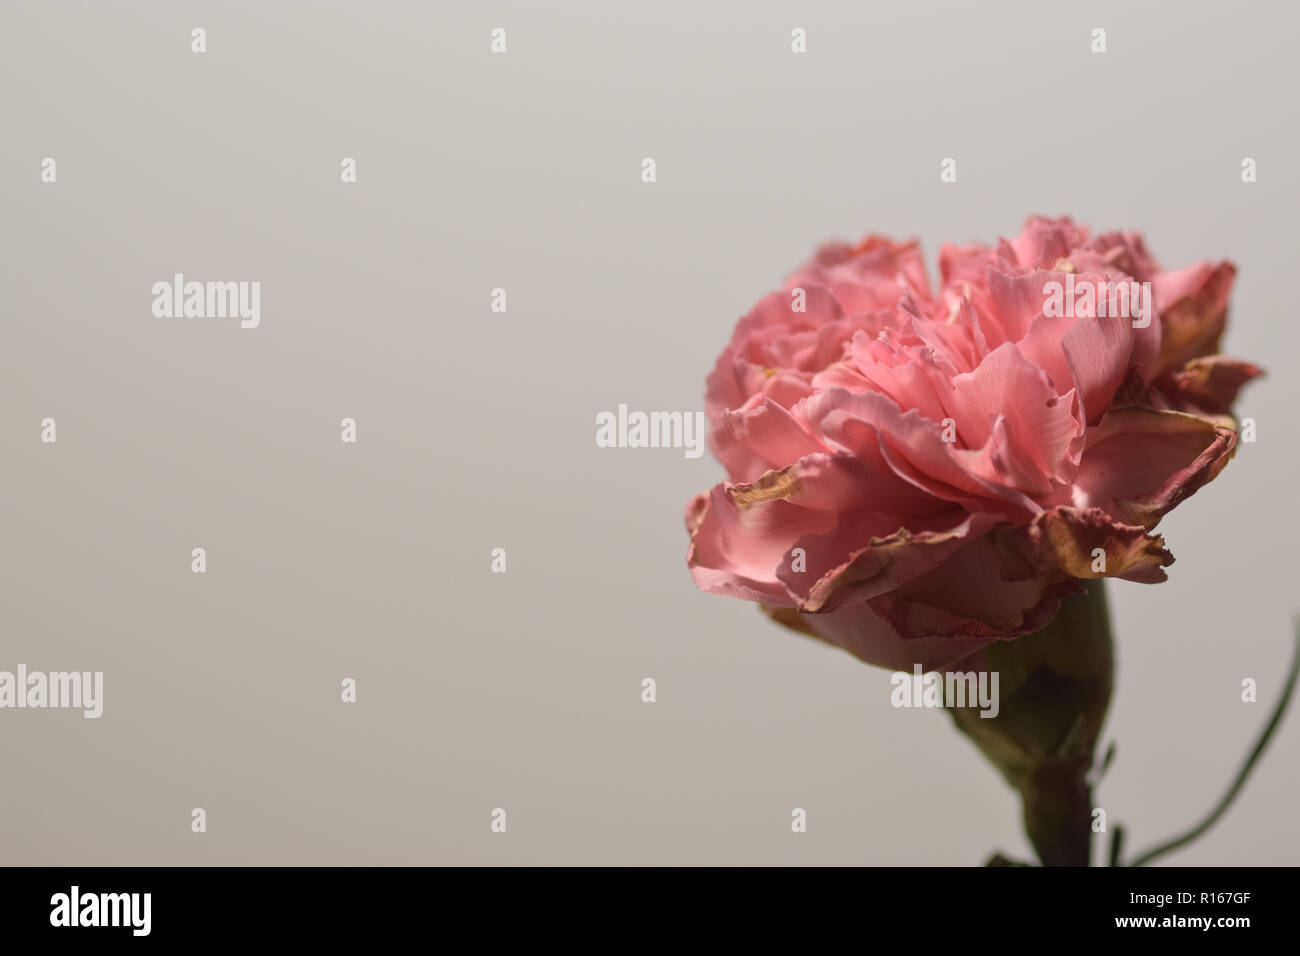 Floral Desktop Immagini Floral Desktop Fotos Stock Alamy